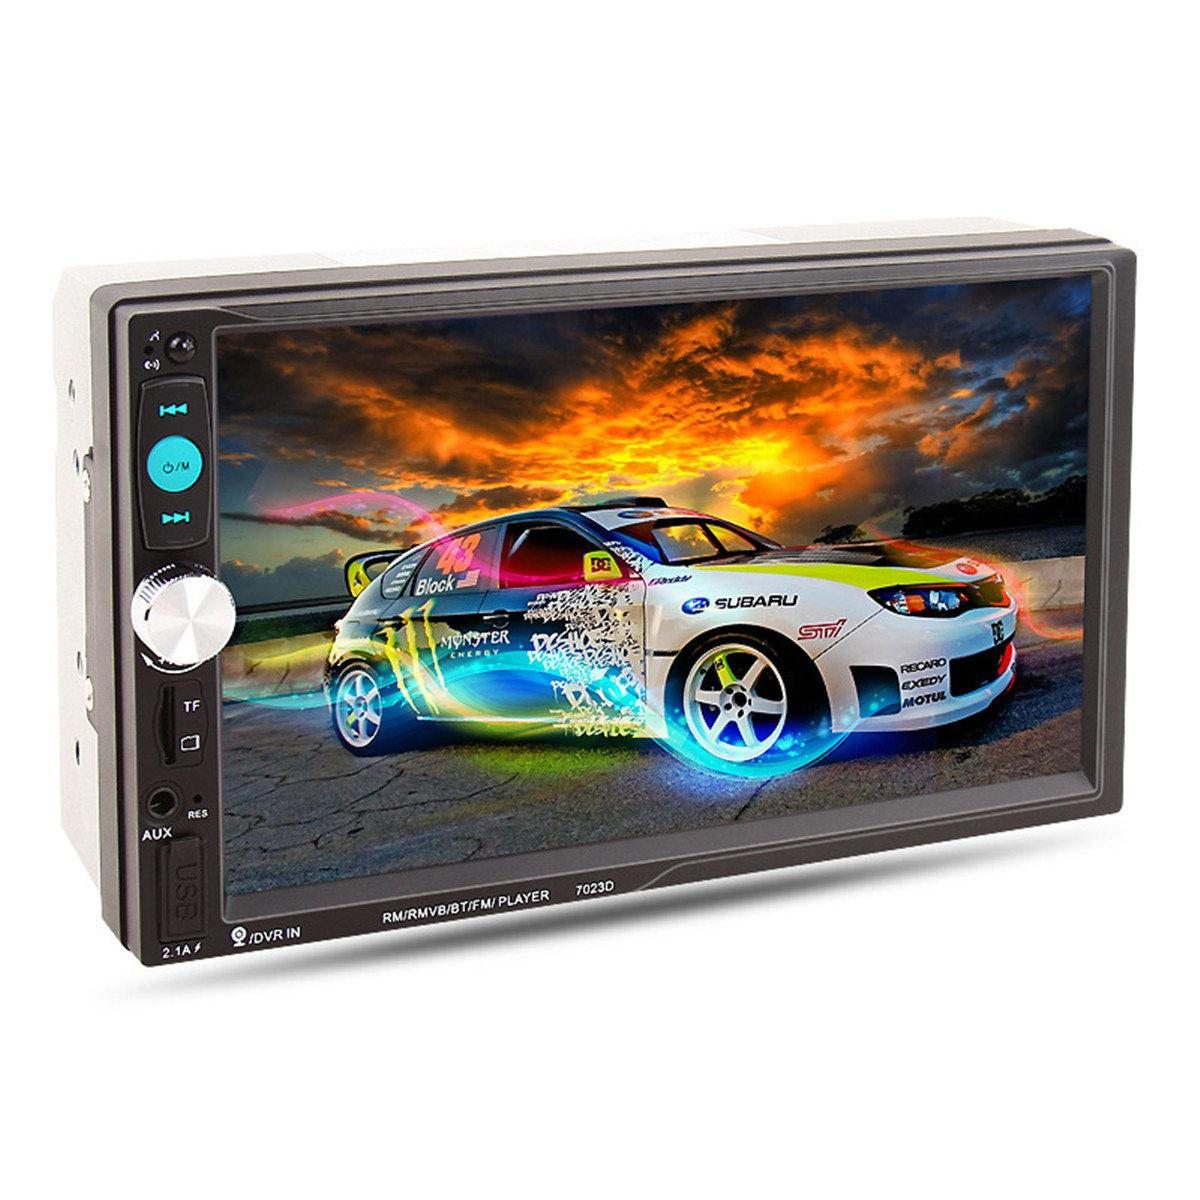 АвтомагнитолаMP5 SR 70232Din экран 7'', USB, SD, MMC, BT, AUX, GPS, MP5,съемная панель